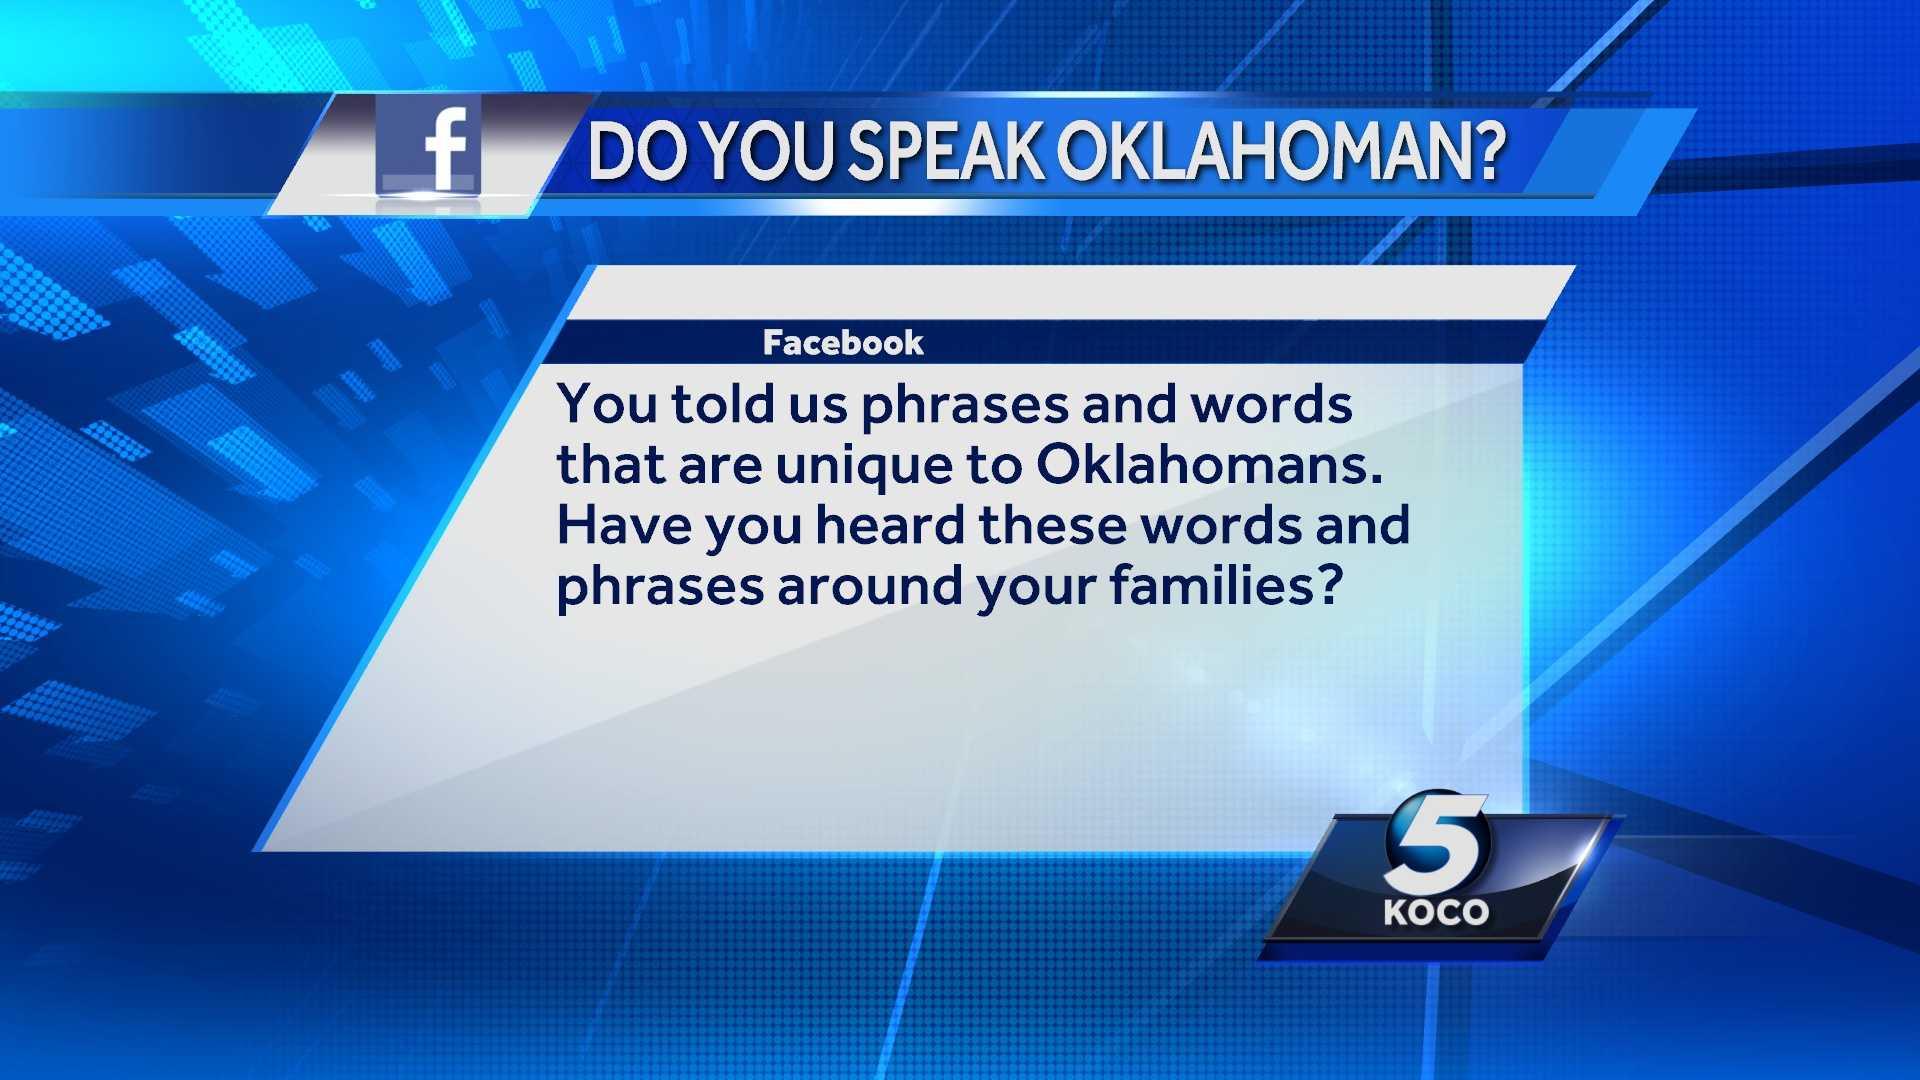 _Do you speak Oklahoman_0120.jpg